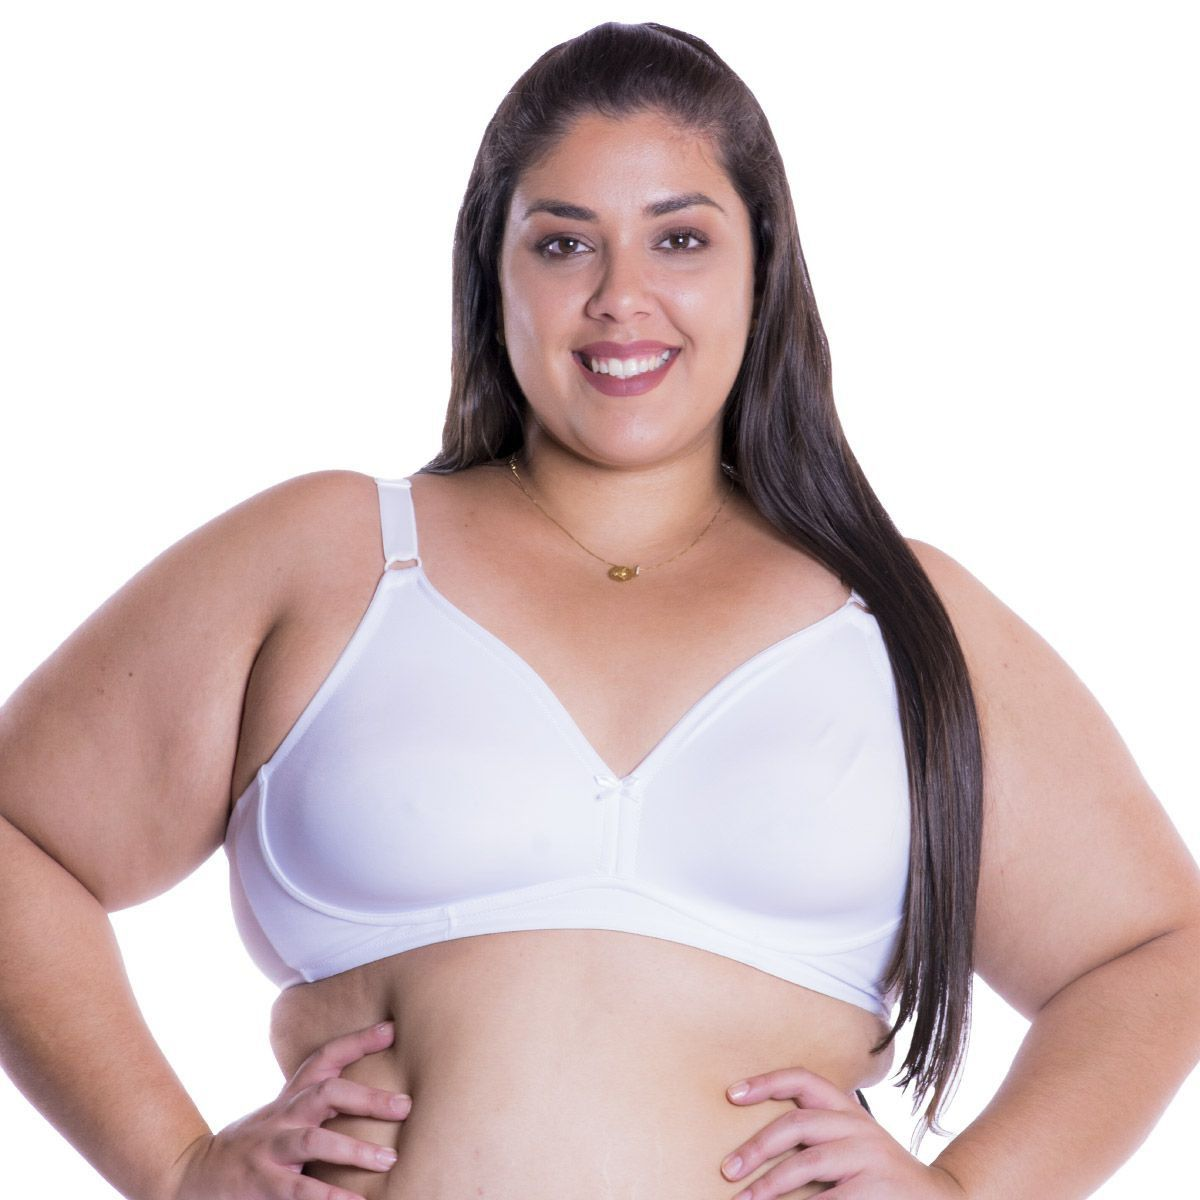 Sutiã Plus Size Nayane Rodrigues Linha Básica Sem Bojo .